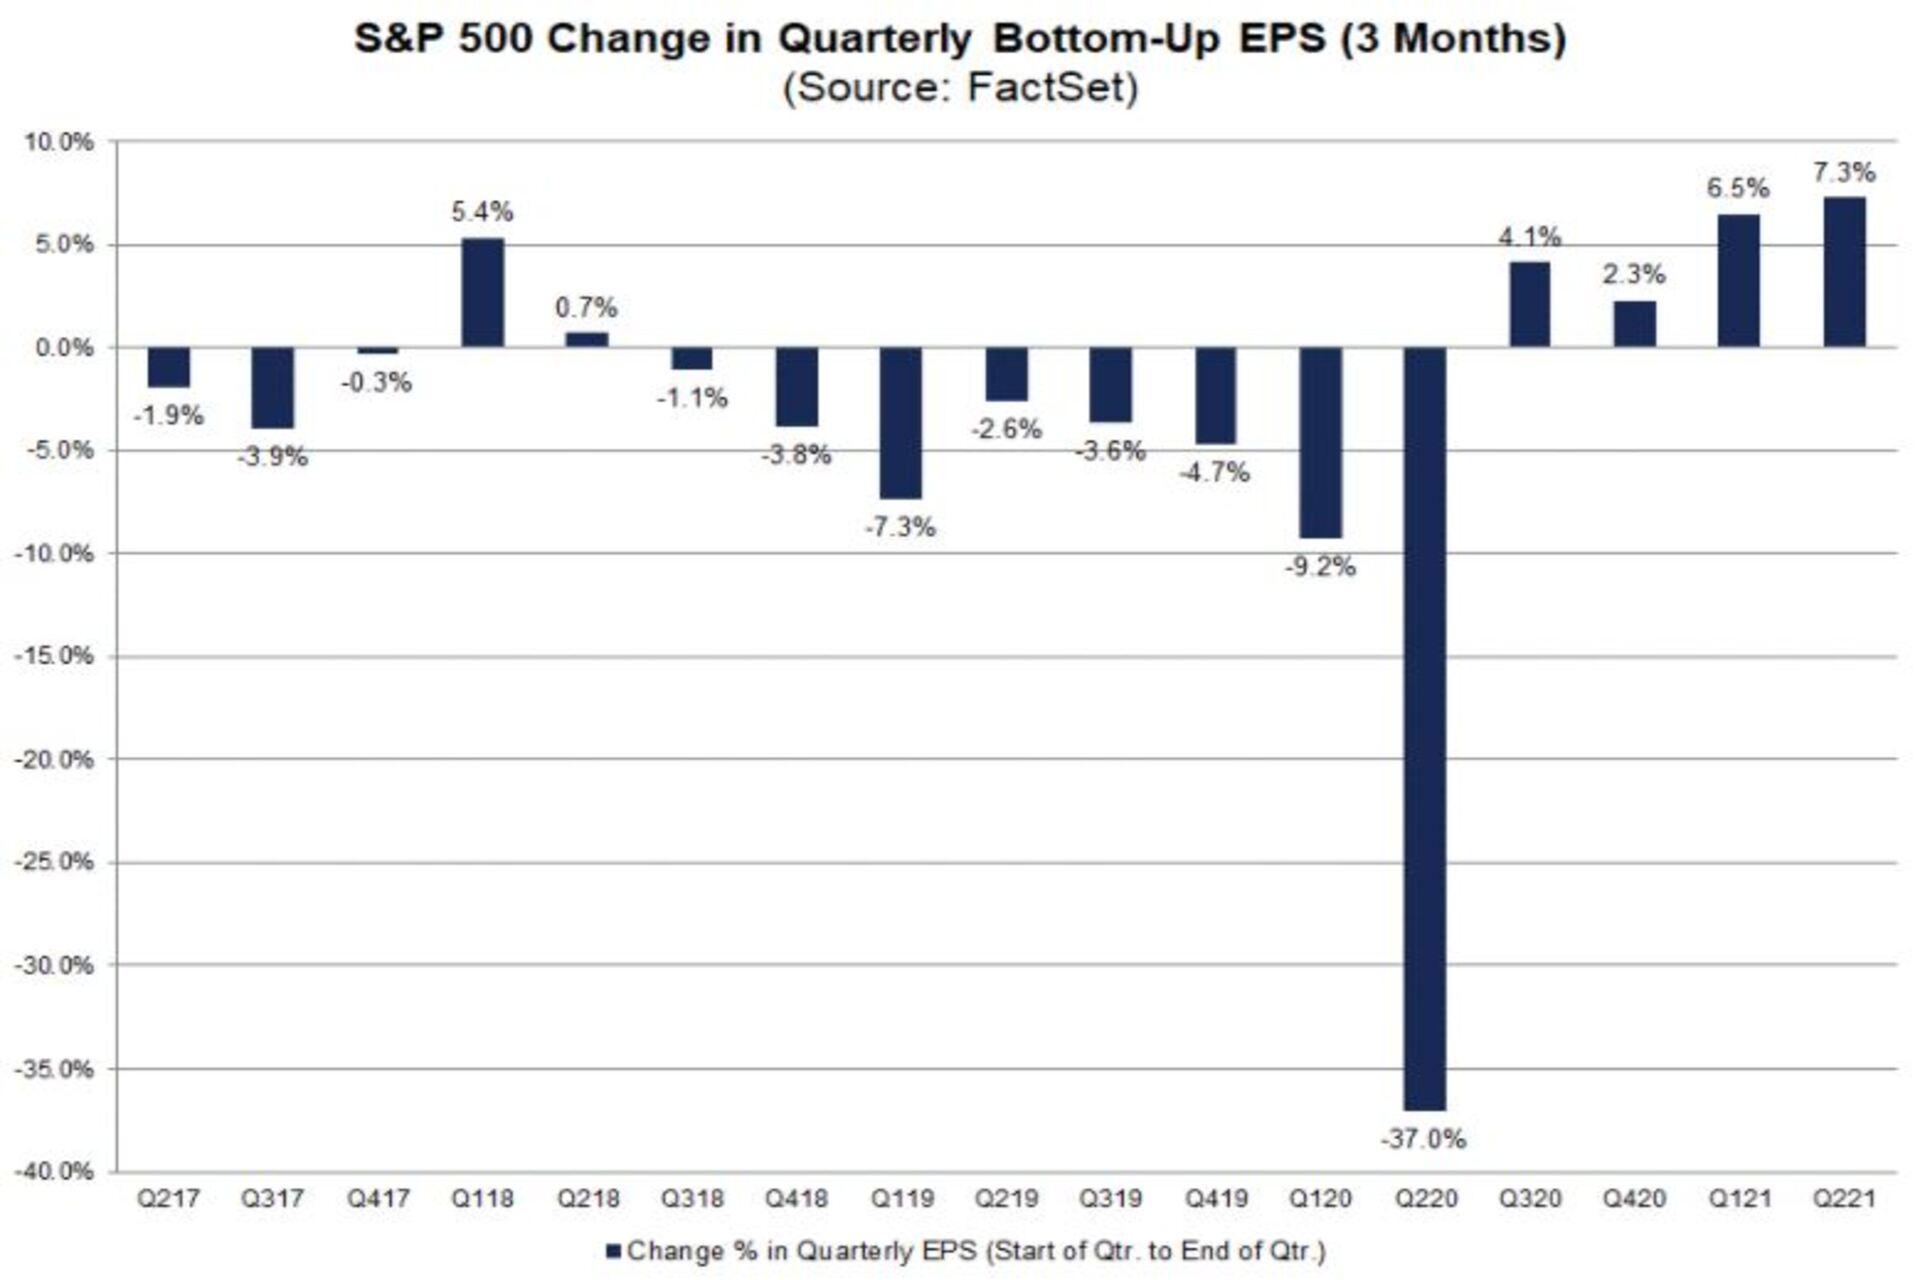 SP500 EPS quarterly revision chart